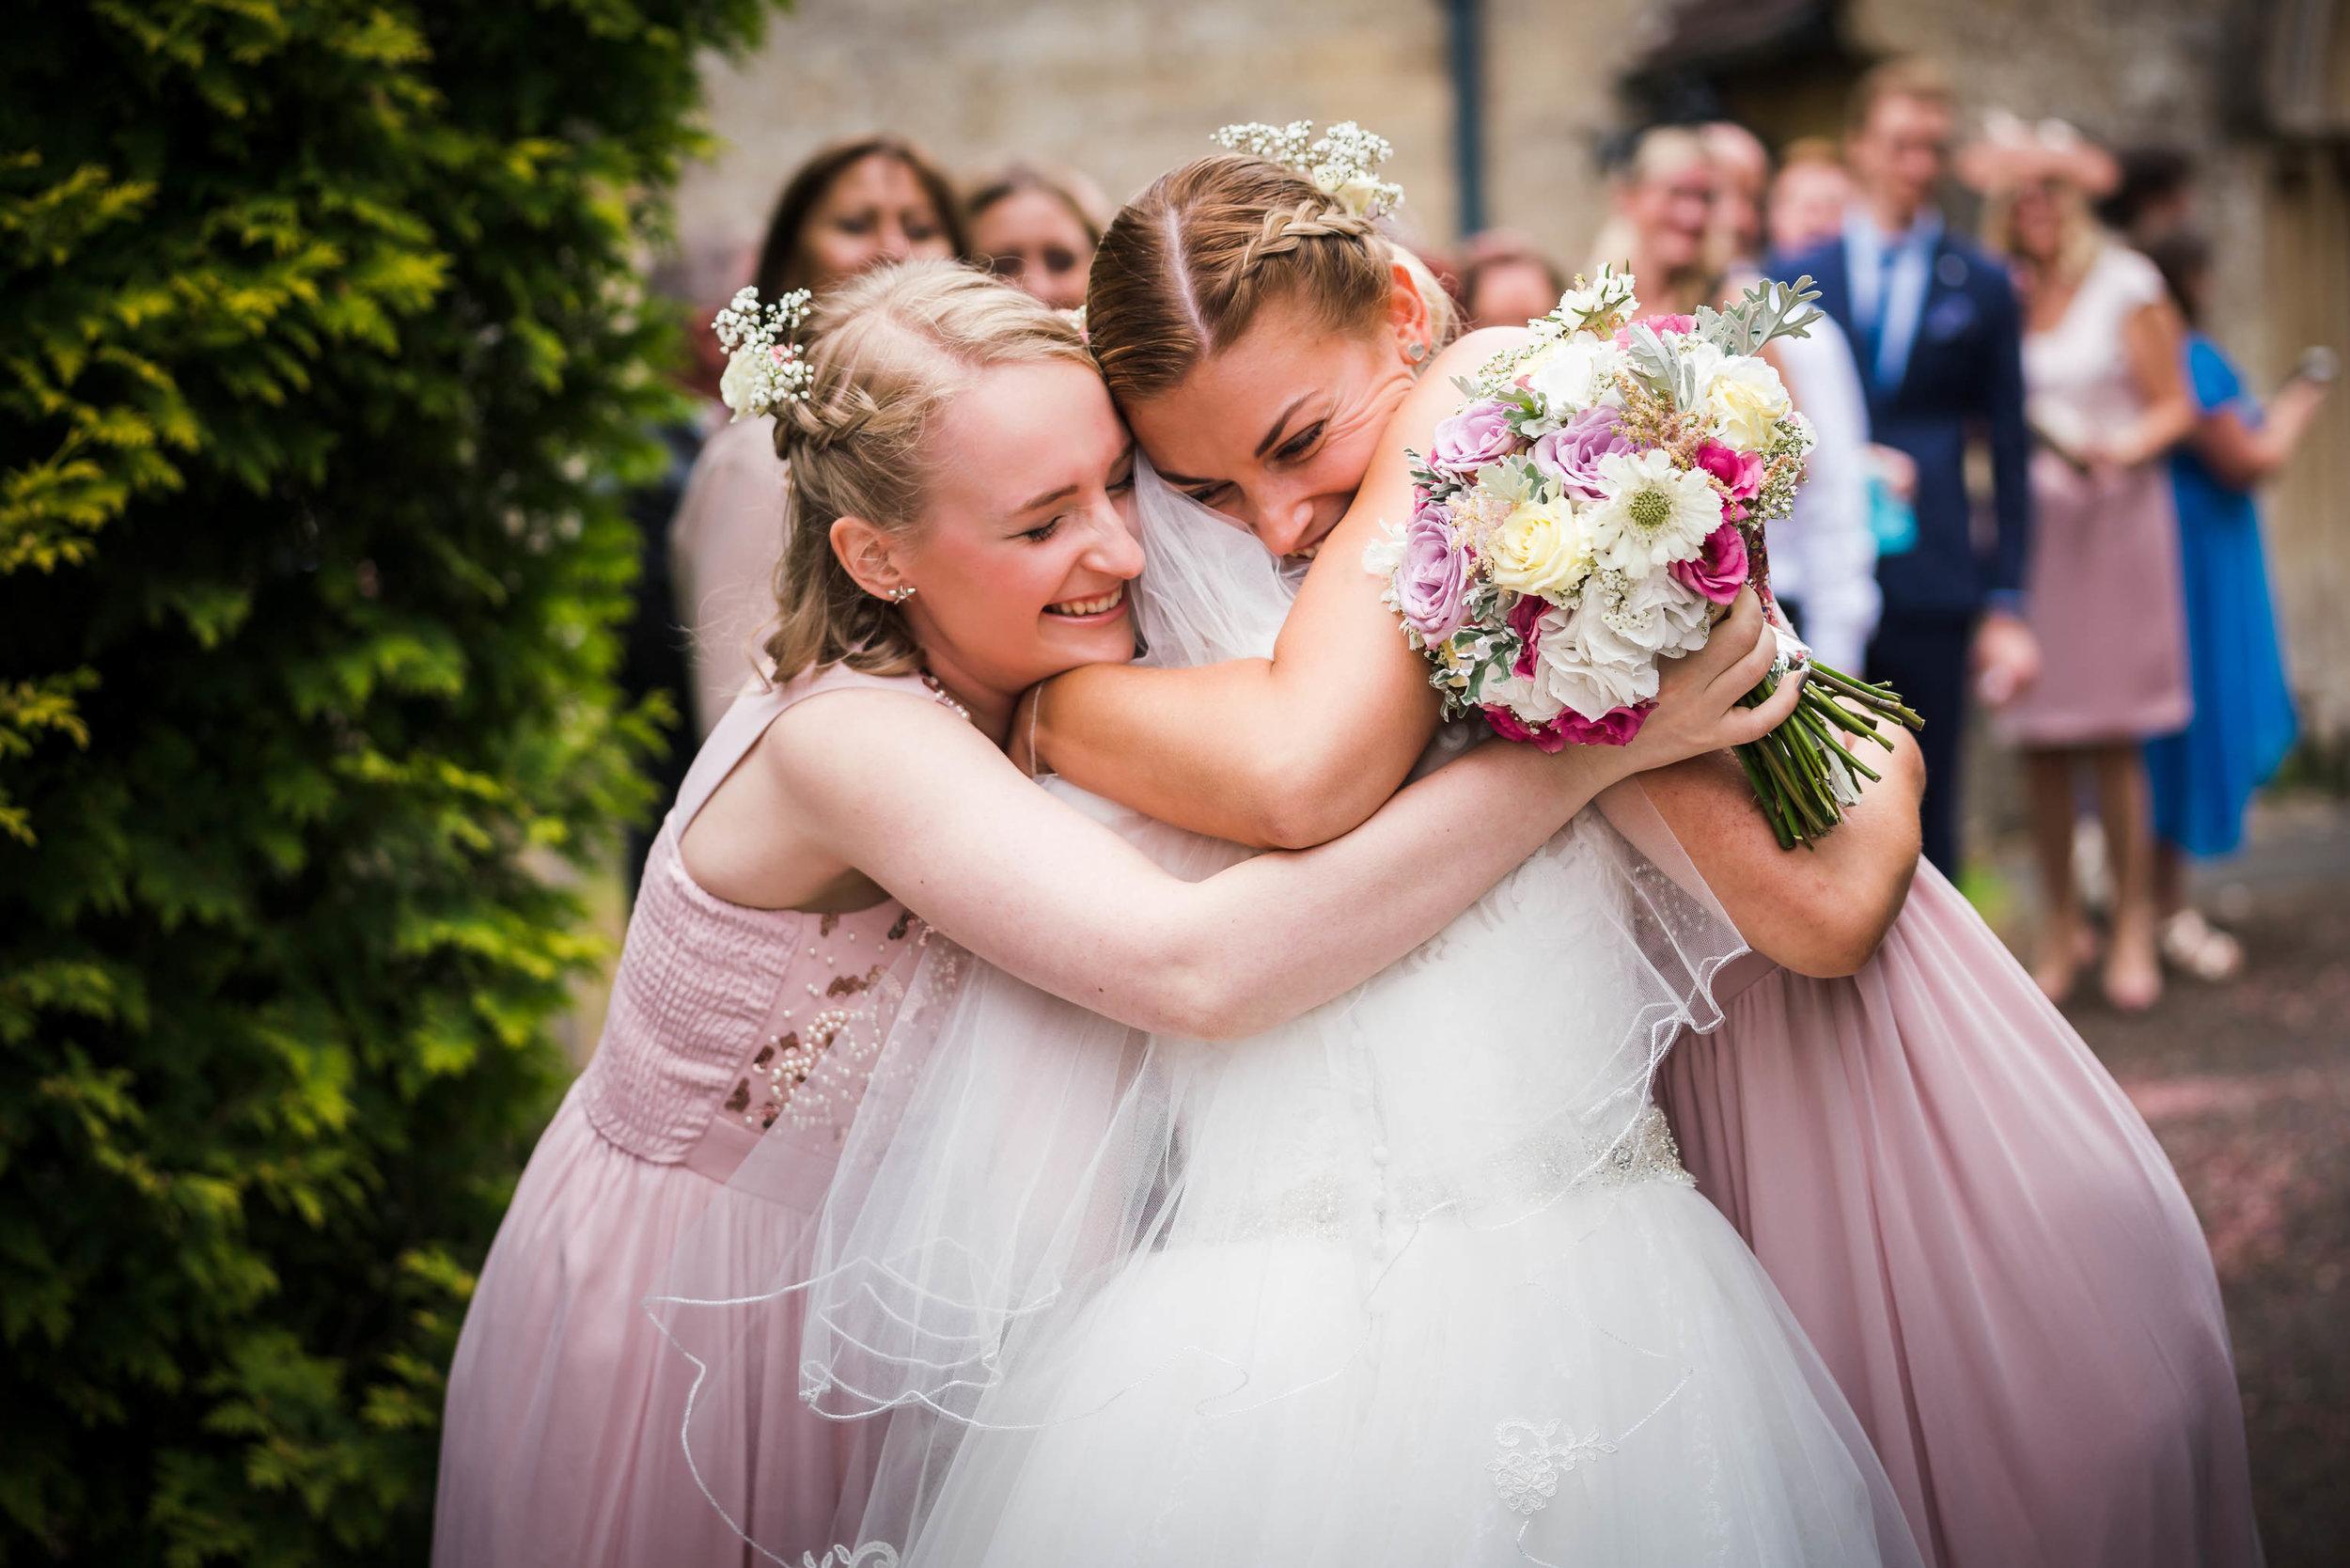 NC-2018-08-11_hannah-and-james-wedding-2416.jpg